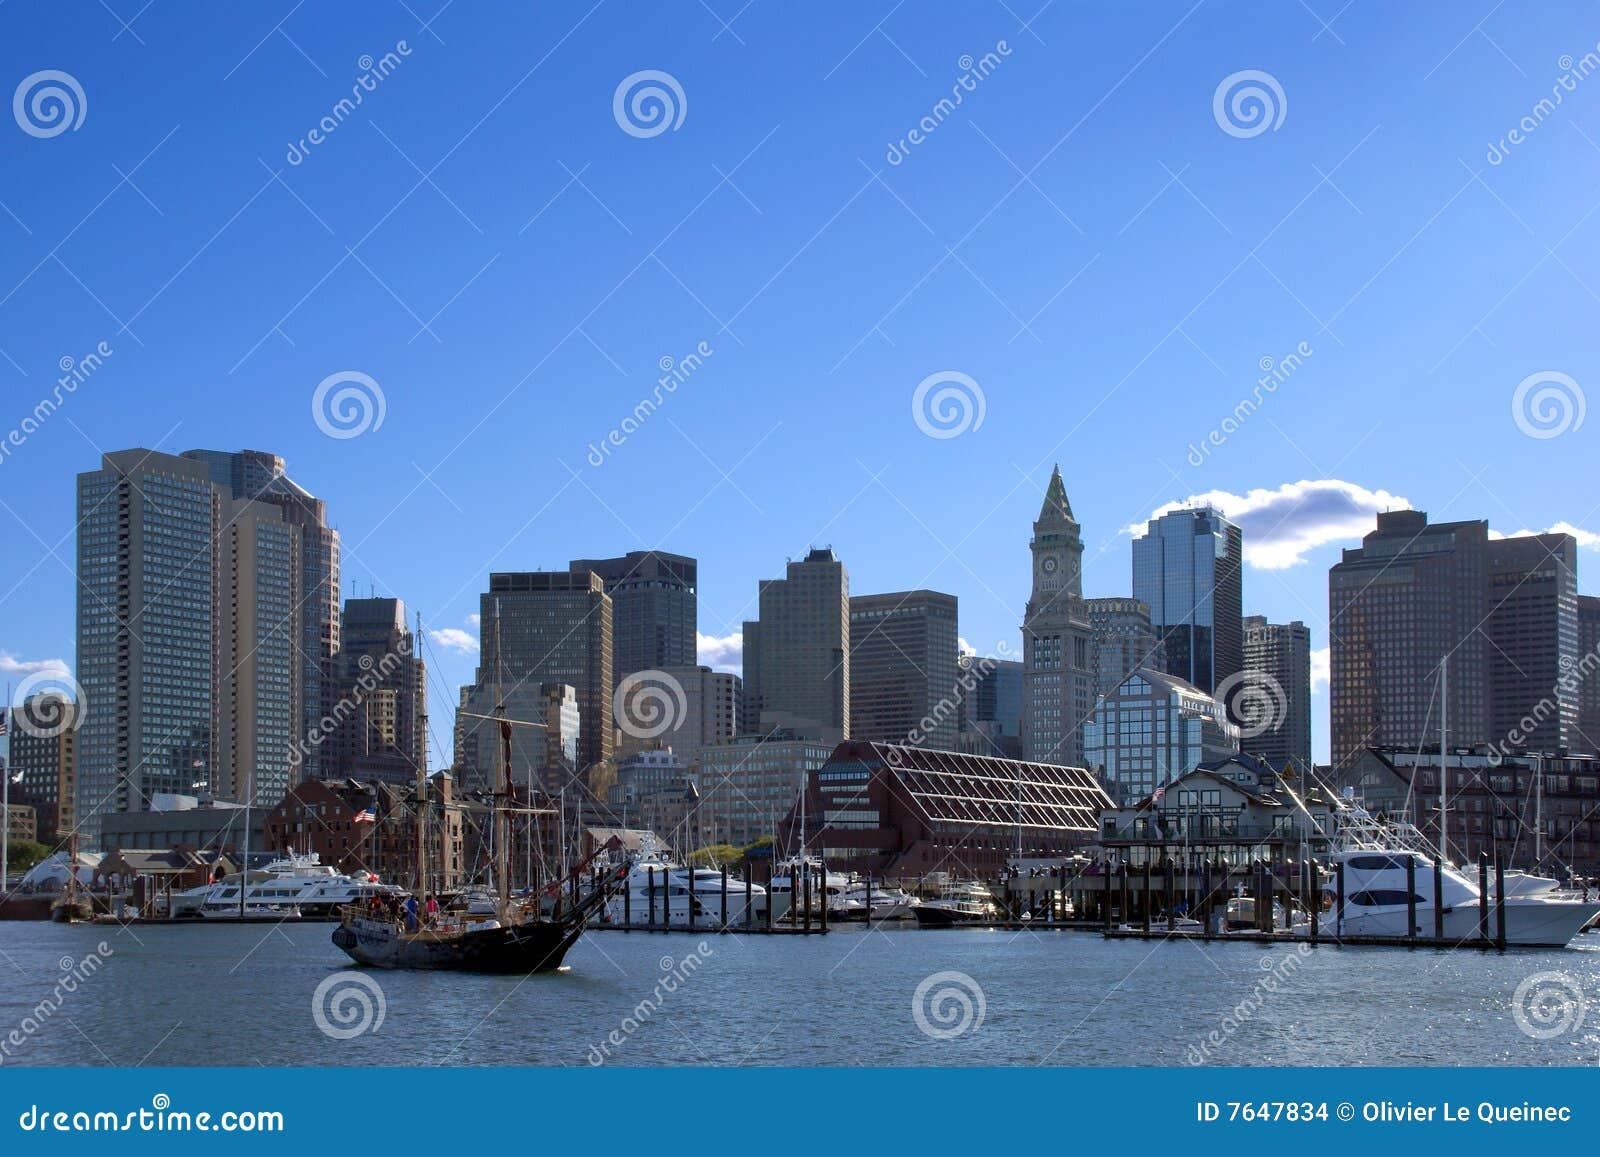 Downtown Boston Harbor Cityscape in Massachusetts